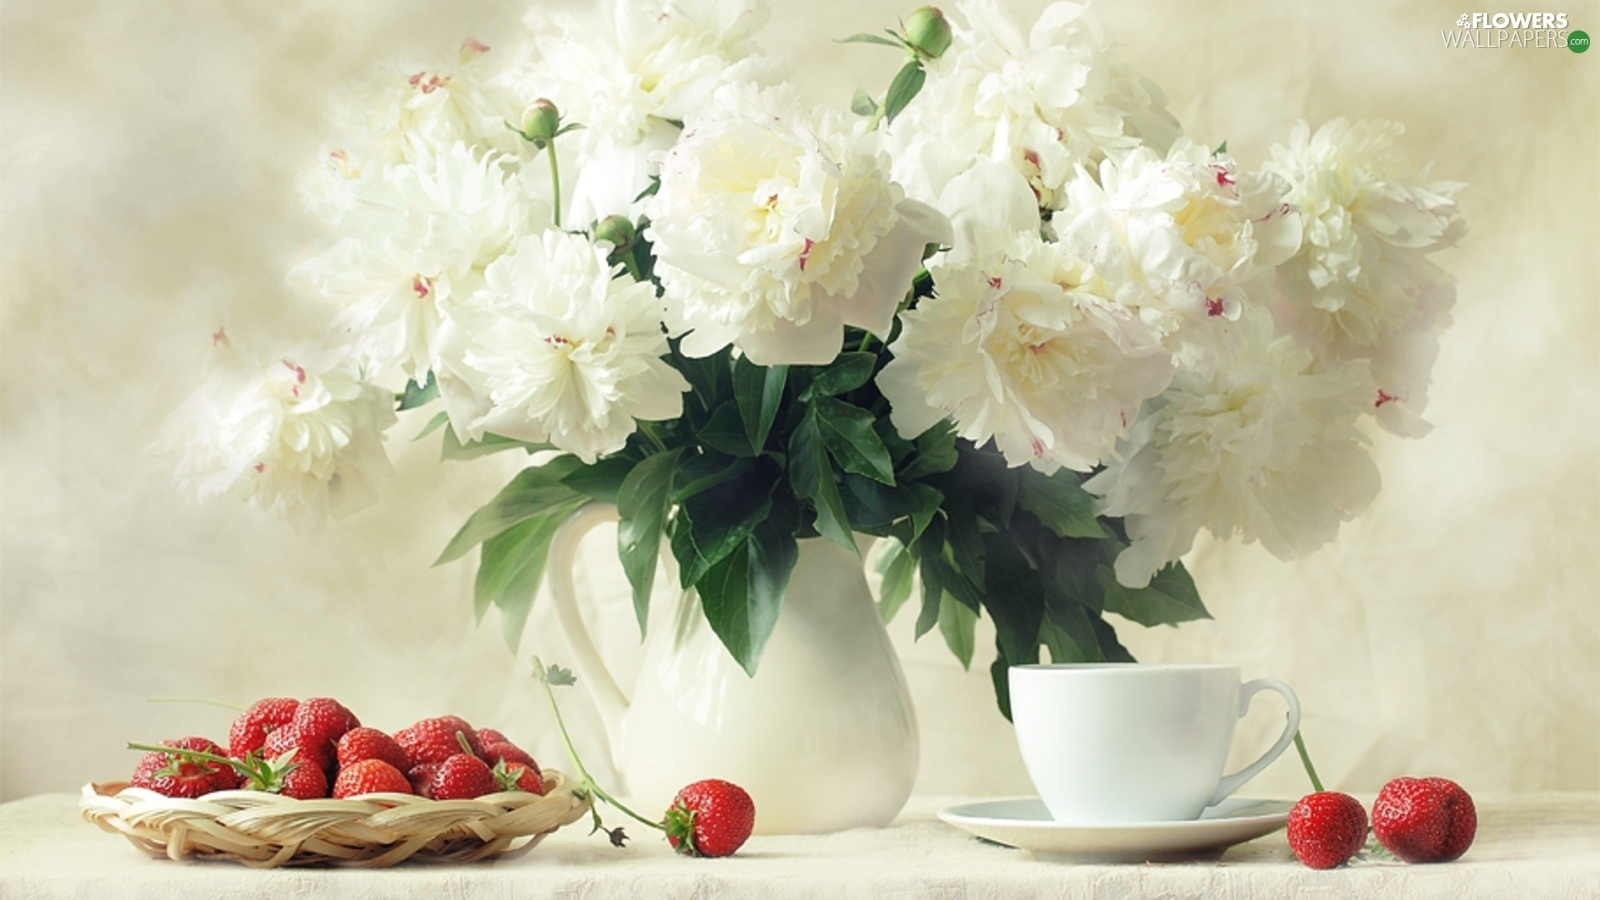 Strawberries White Peonies Flowers Wallpapers 1600x900